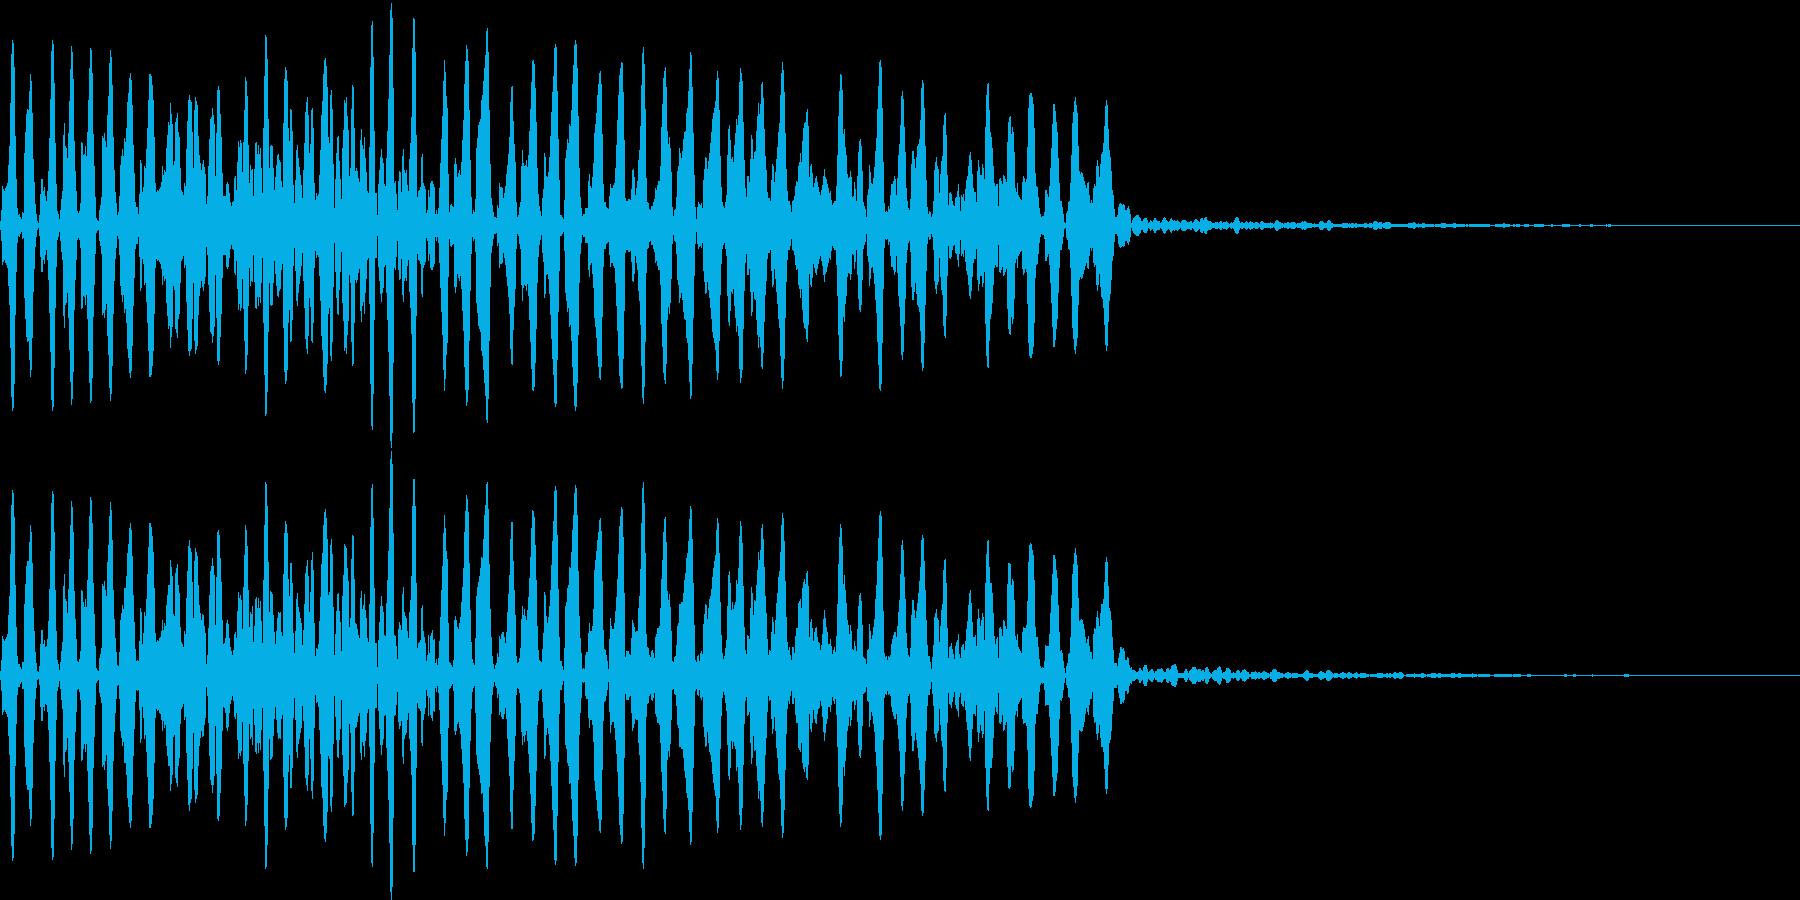 Animal 虫の鳴き声 教育・絵本にの再生済みの波形